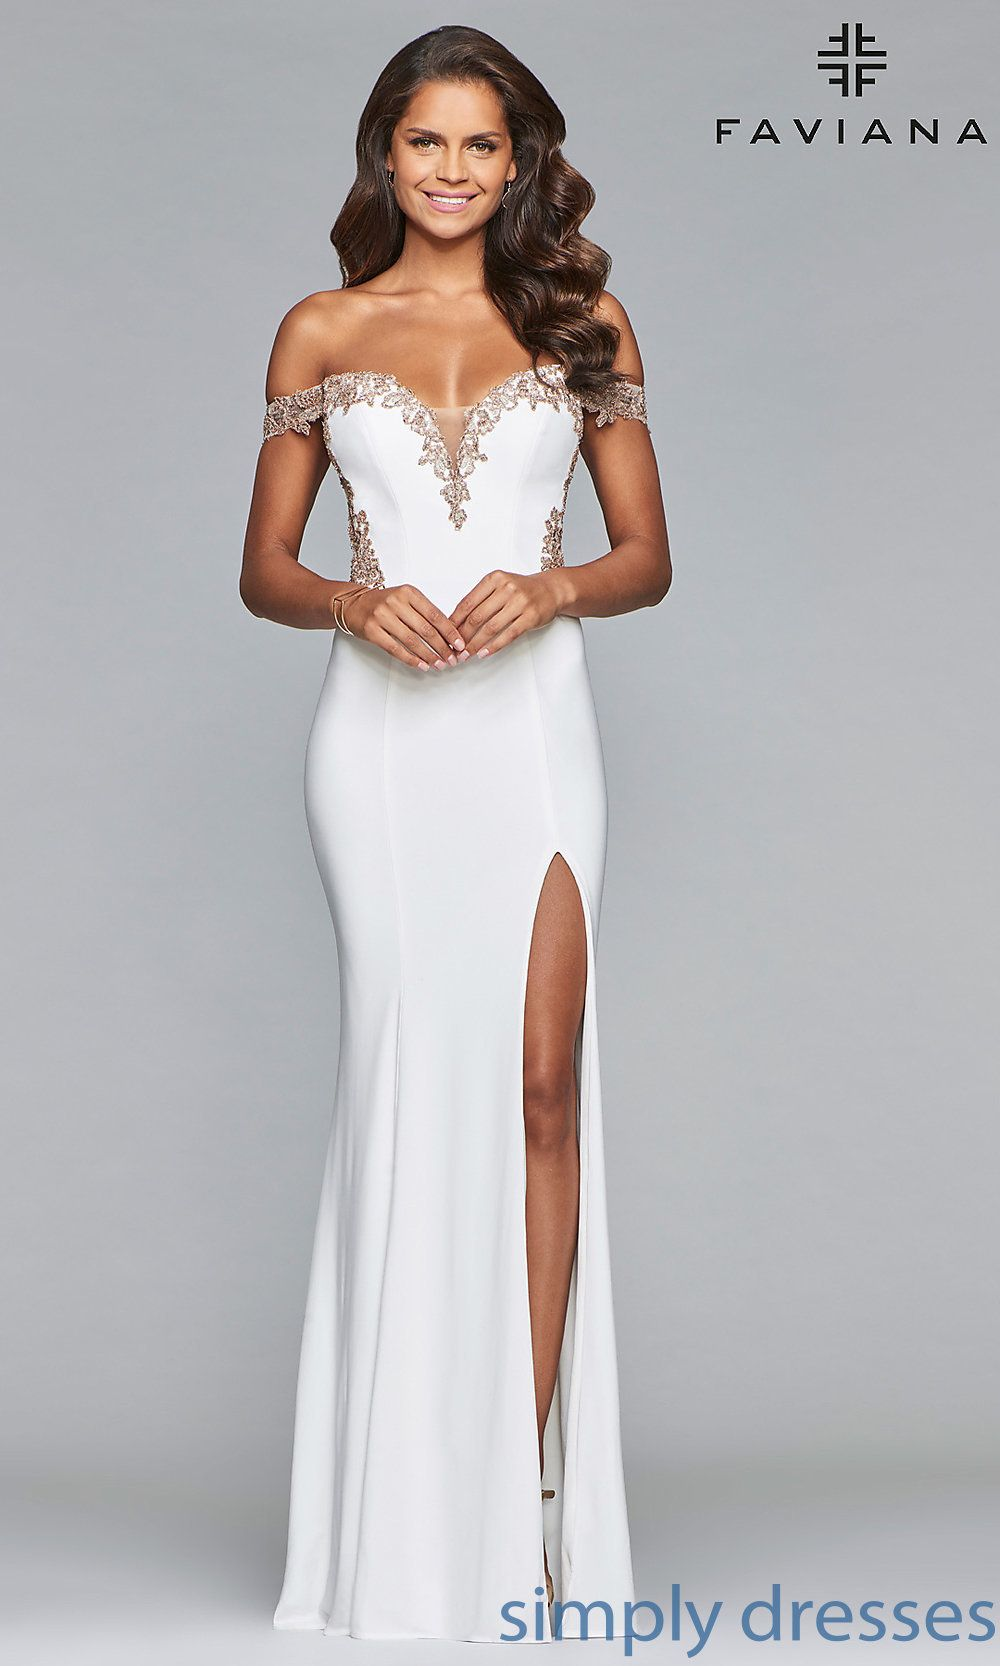 Long Faviana Off The Shoulder Sheer Back Prom Dress Faviana Prom Dresses Faviana Dresses Formal Dresses [ 1666 x 1000 Pixel ]